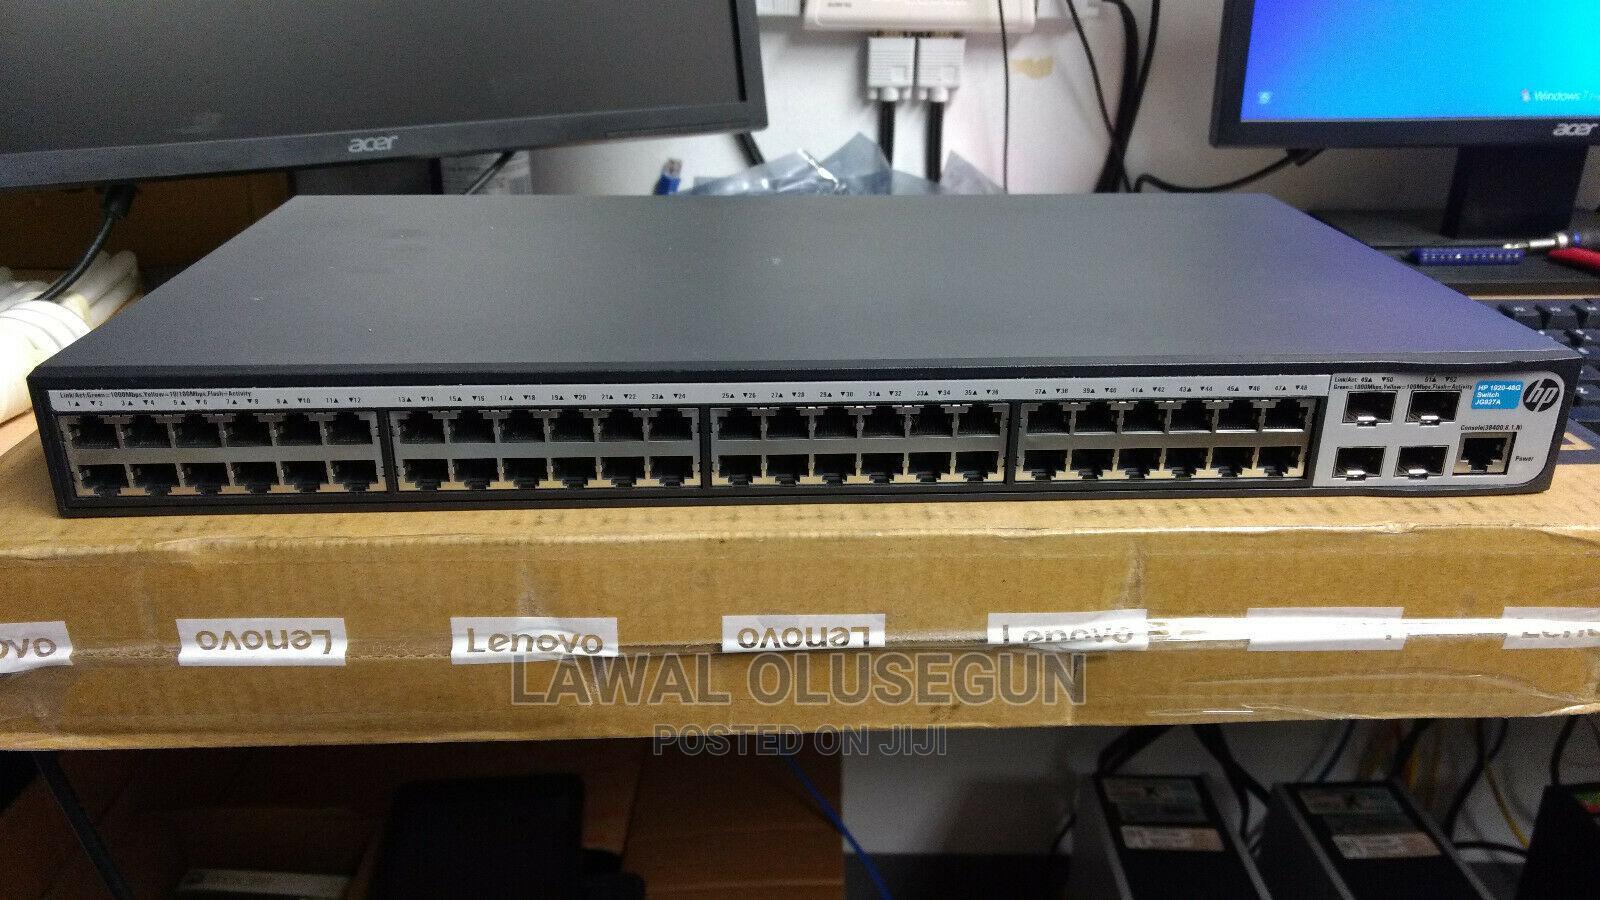 HP / HPE Officeconnect 1920-48g 48 Port Gigabit Smart